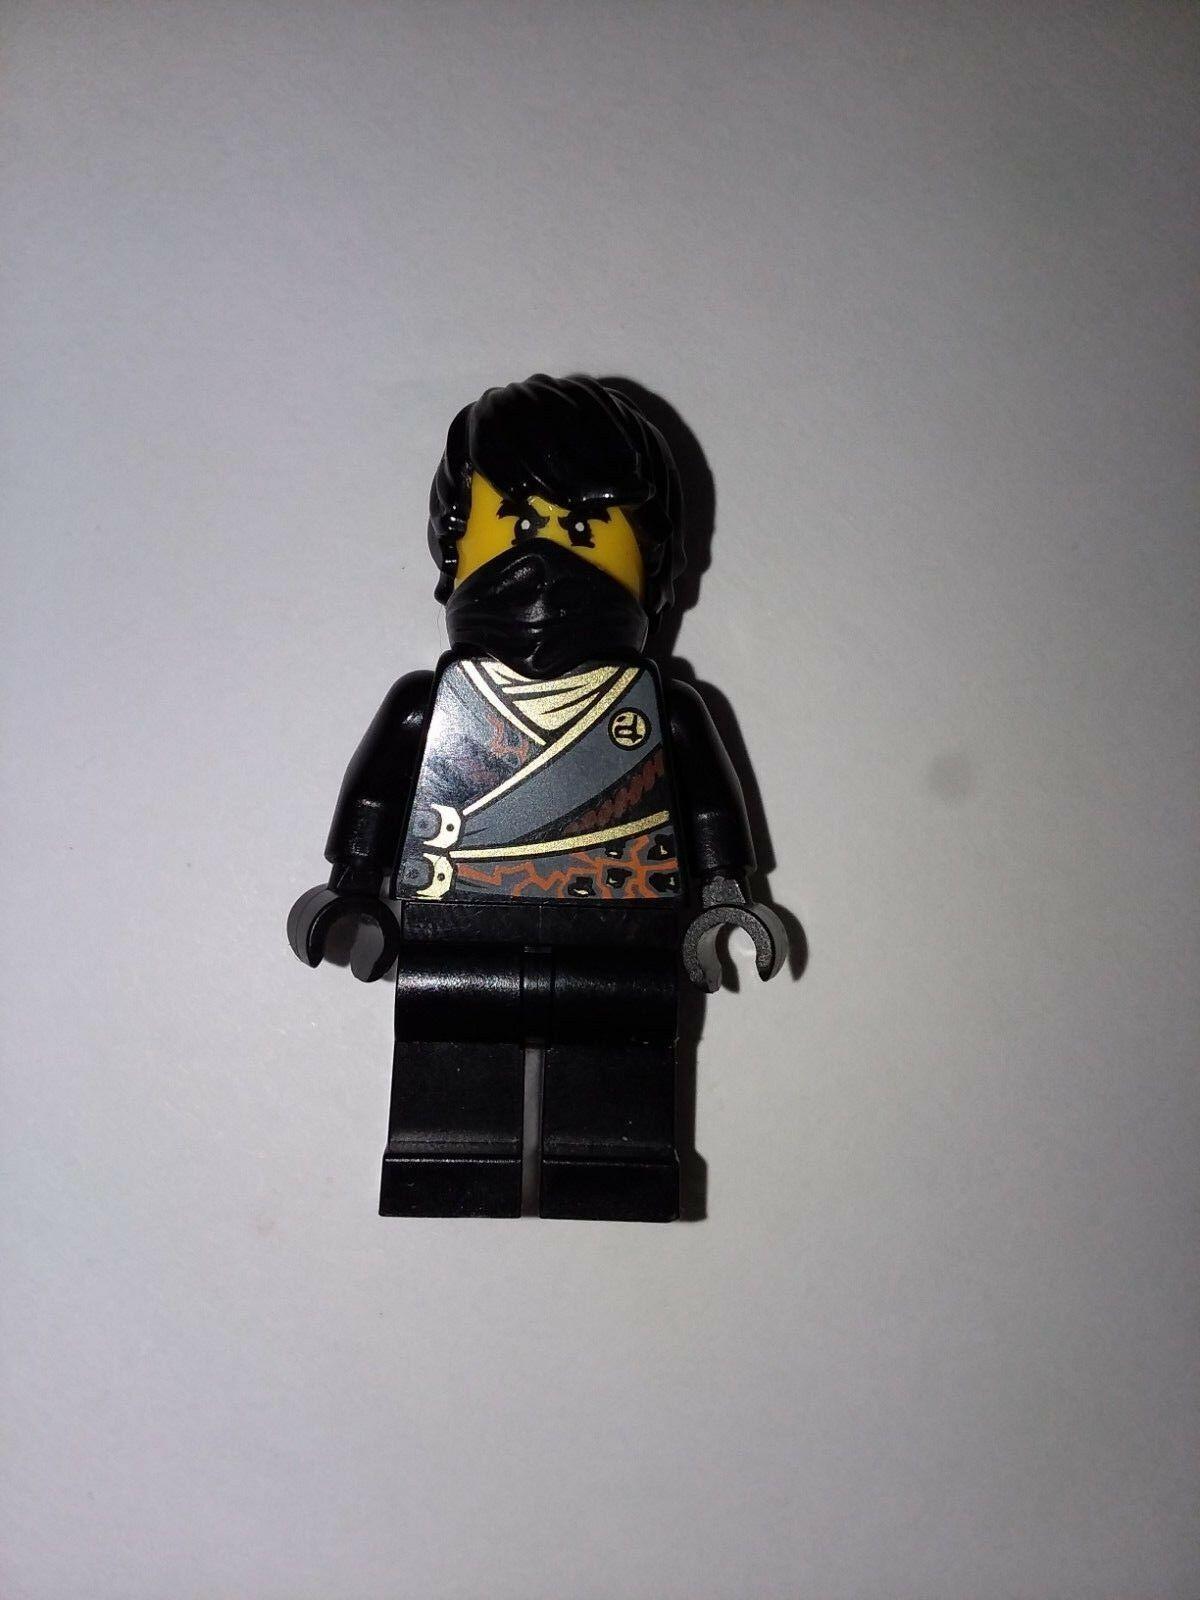 LEGO Ninjago 70723 Black Ninja Cole Rebooted with Sword Minifigure NEW D34  LEGO Minifiguren